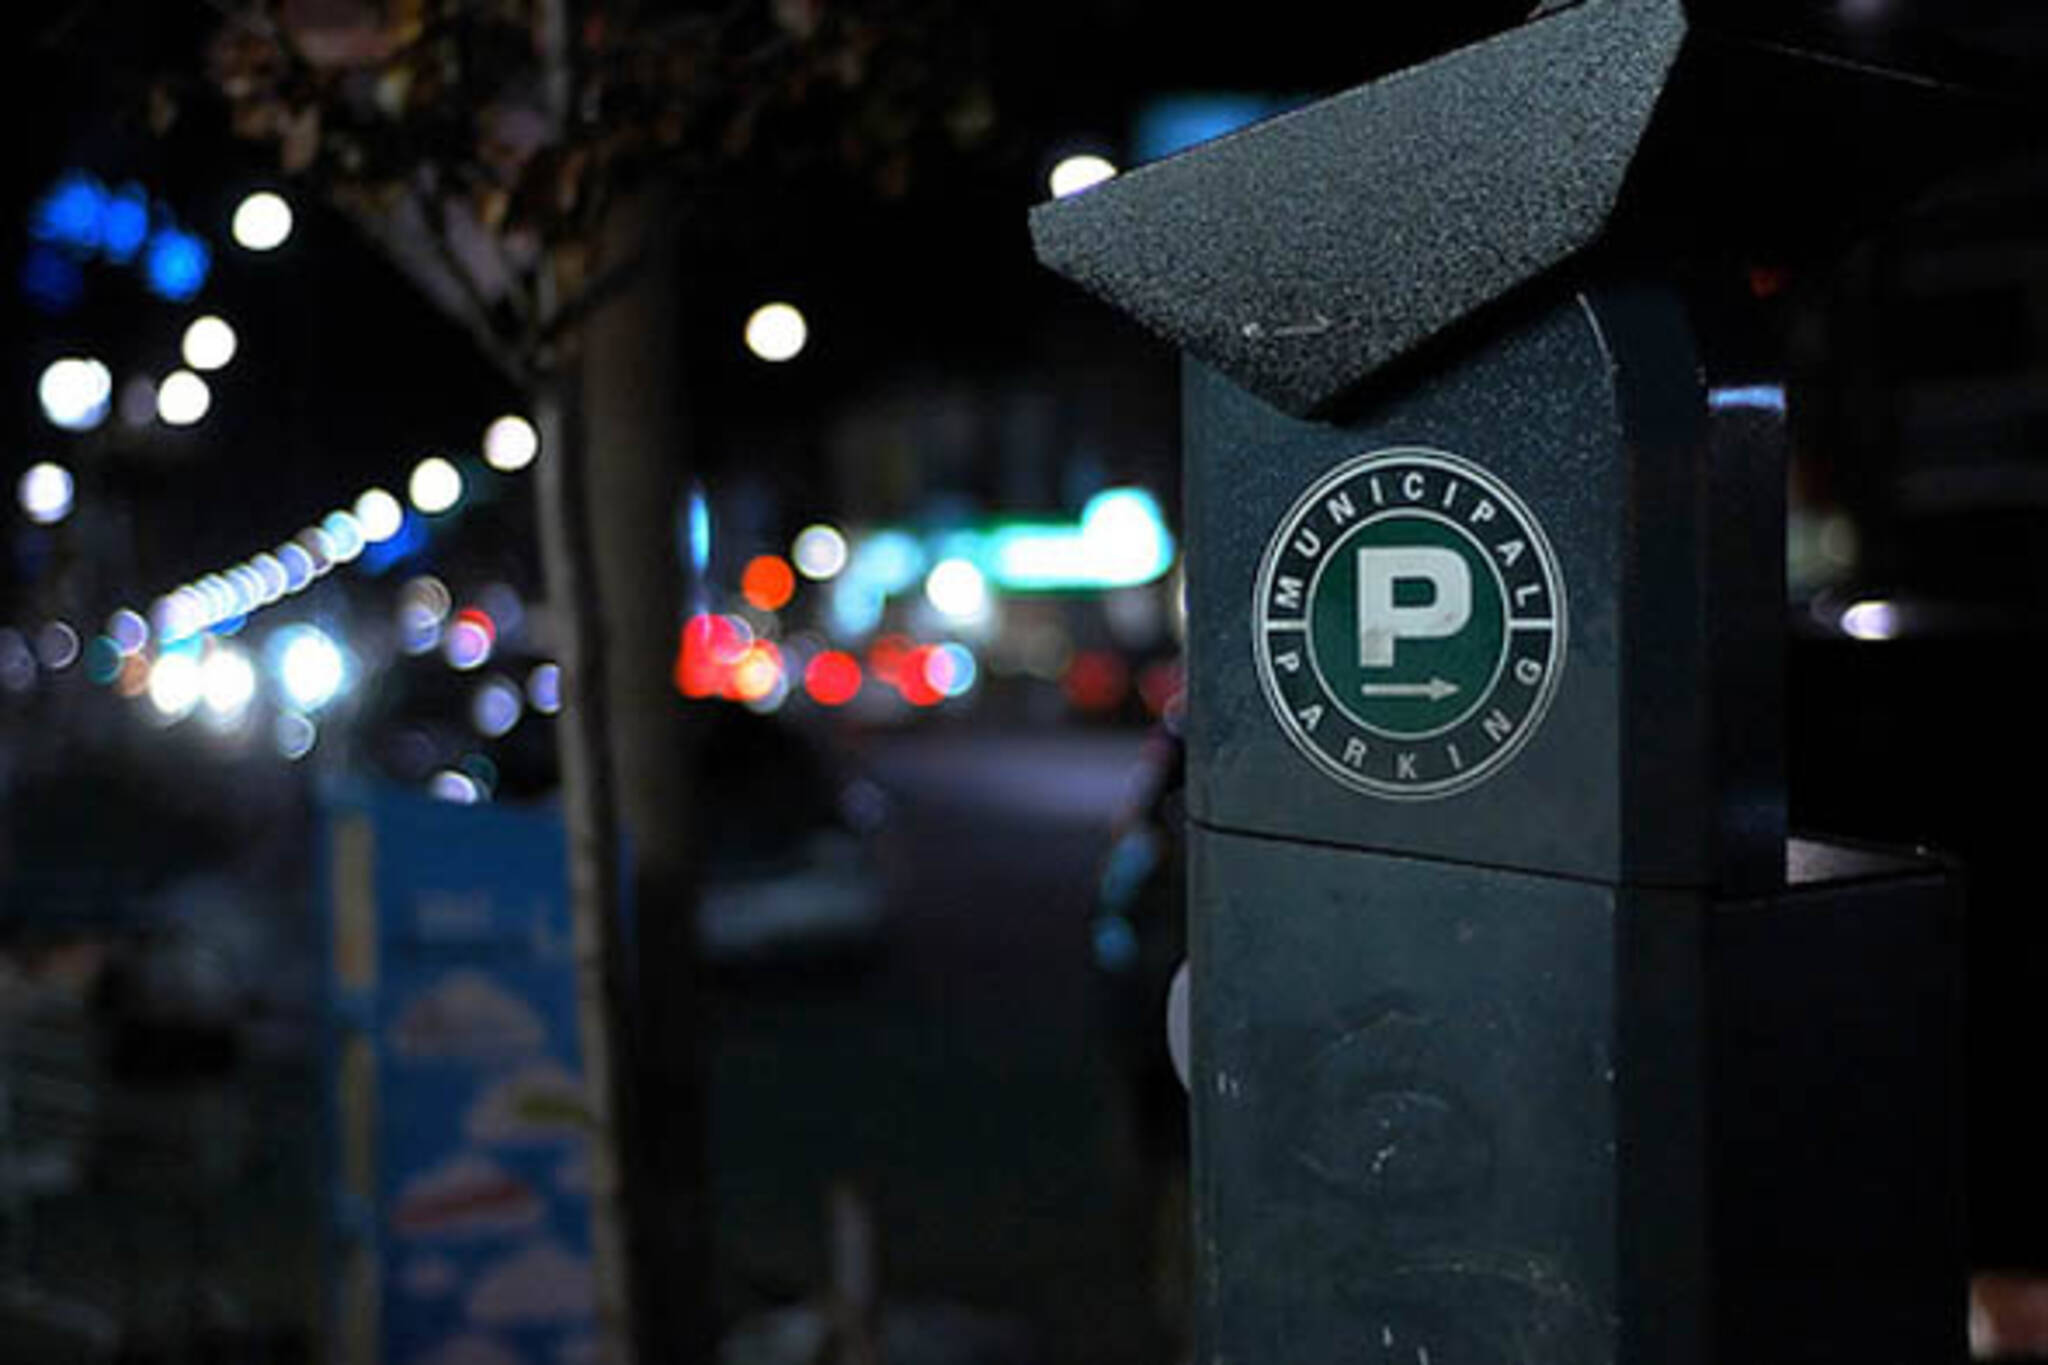 Green P parking web site toronto